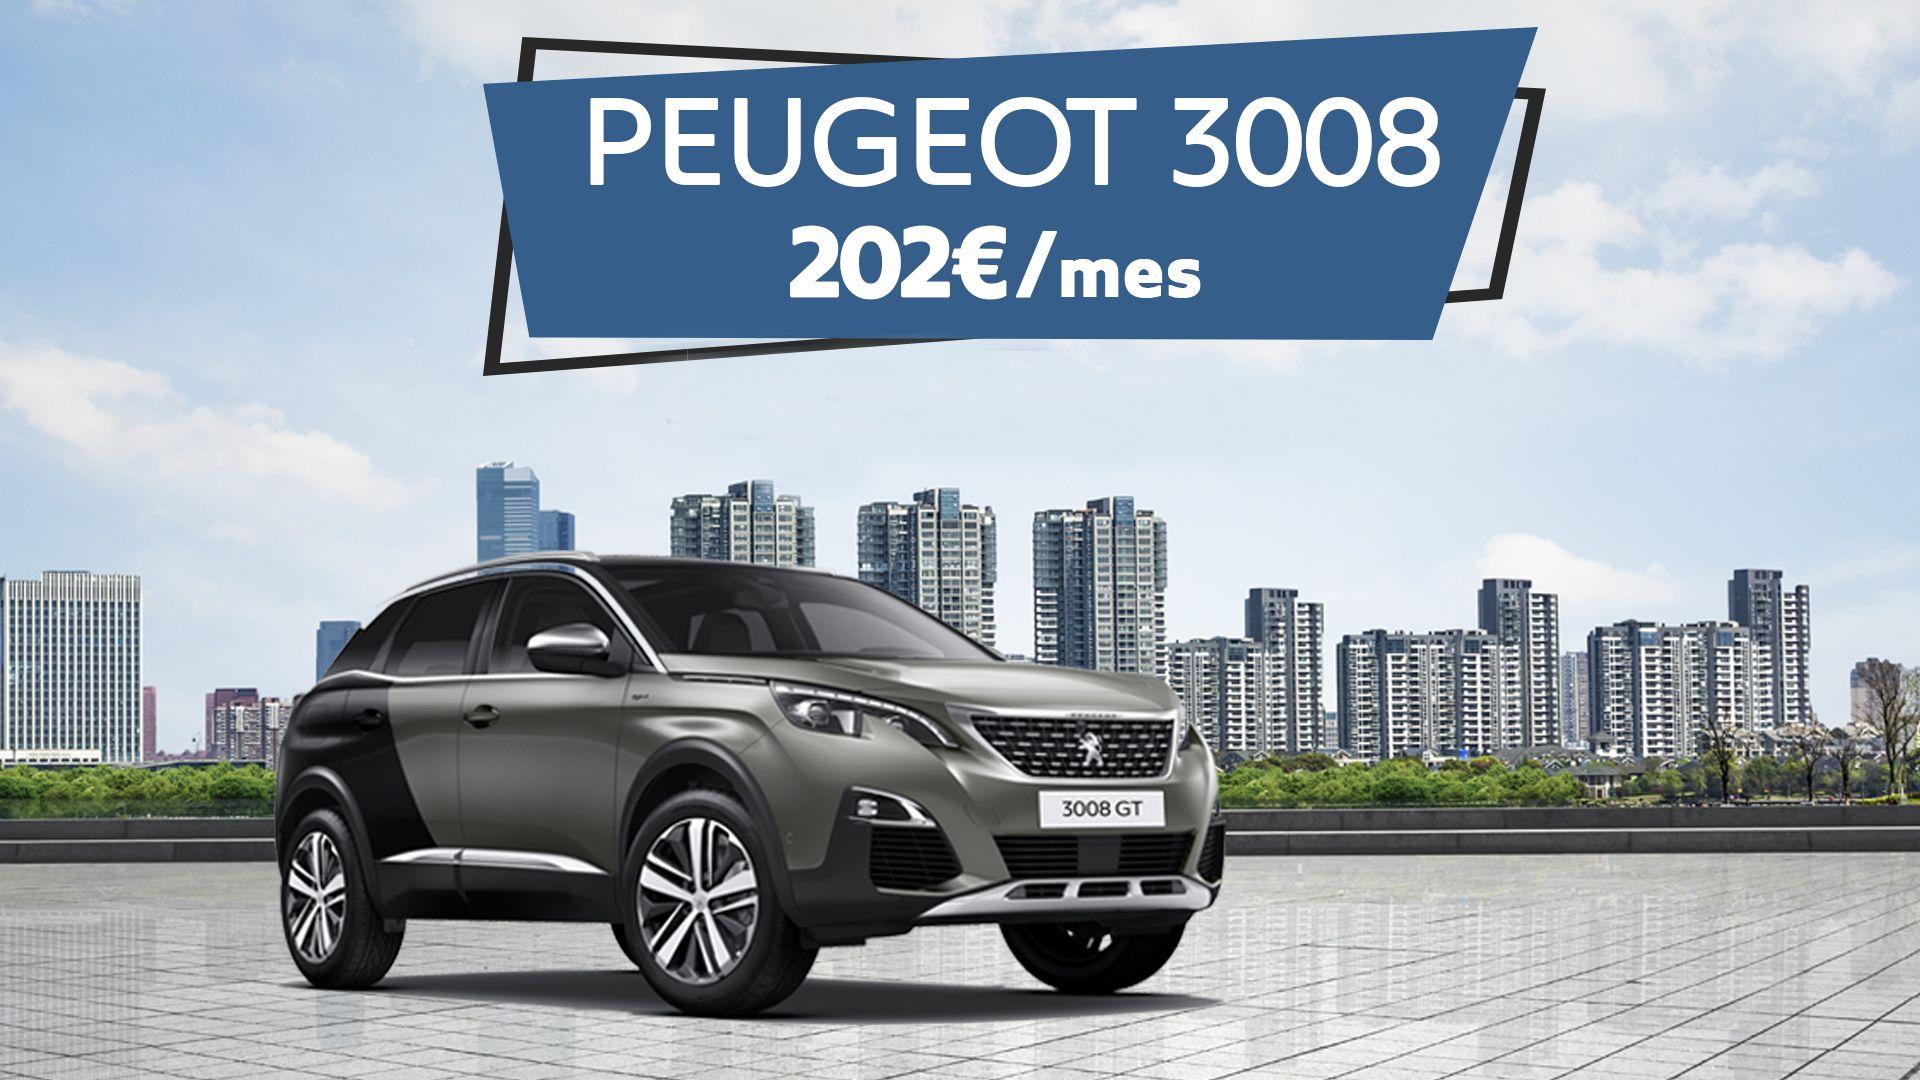 Llévate un SUV Peugeot 3008 por sólo 202€/mes